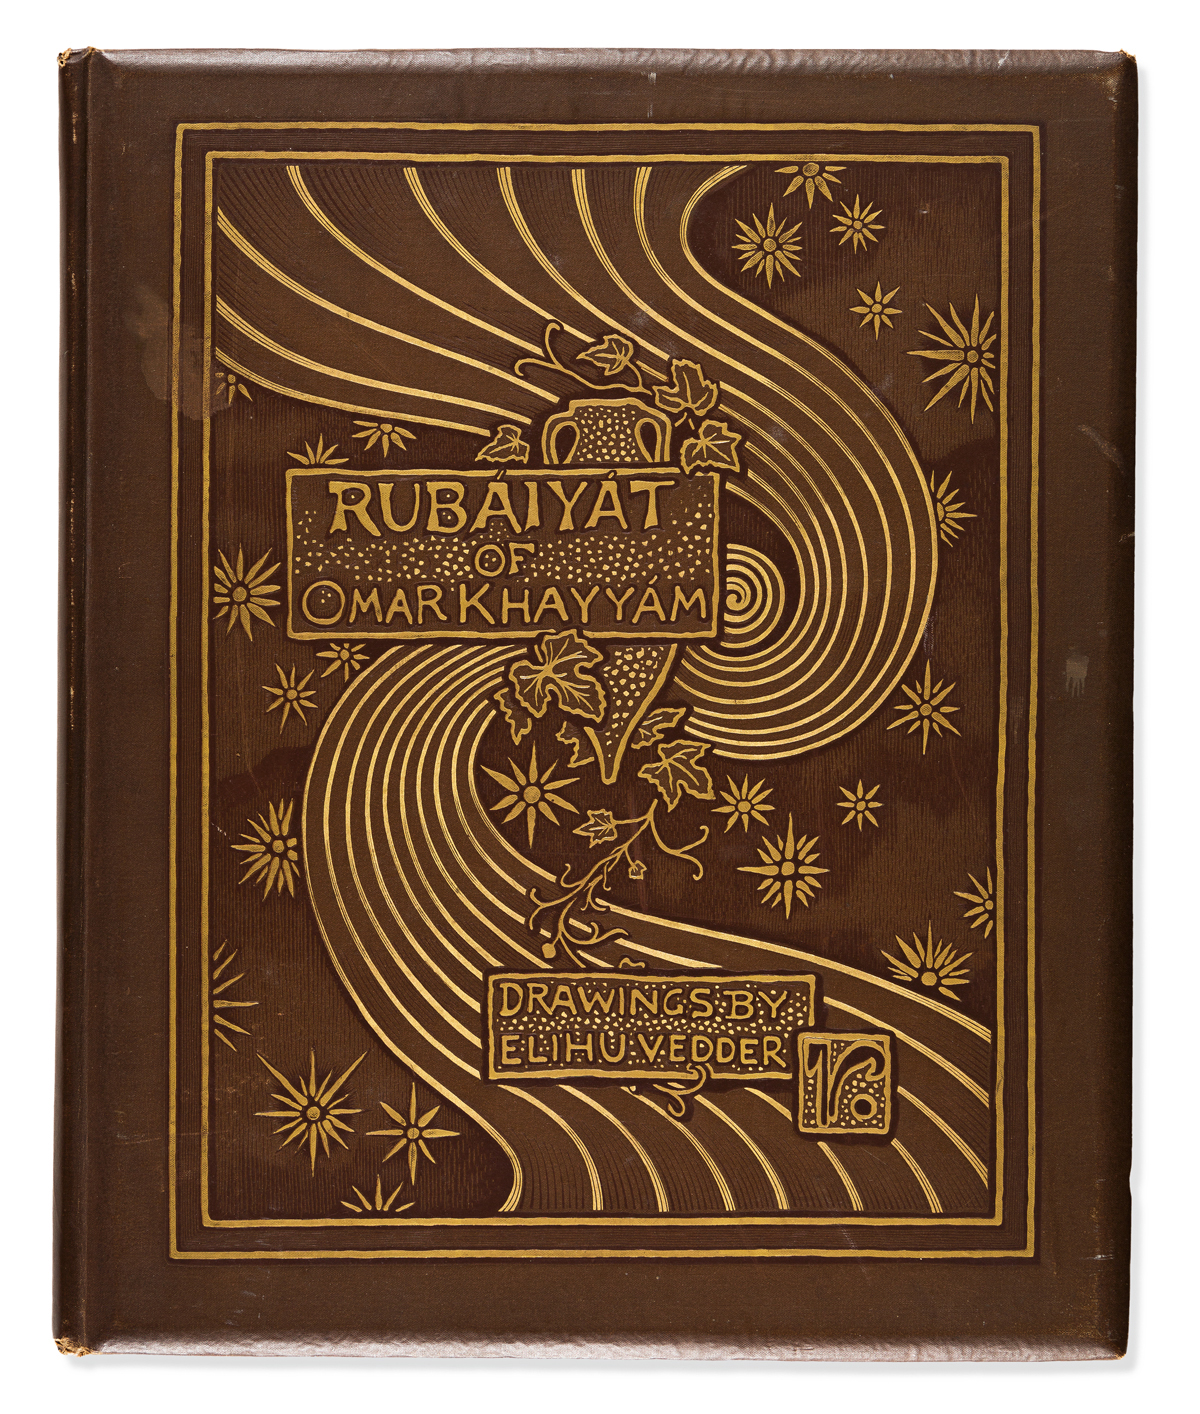 (RUBAIYAT.) VEDDER, ELIHU (illus.) The Rubaiyat of Omar Khayyam: The Astronomer-Poet of Persia.